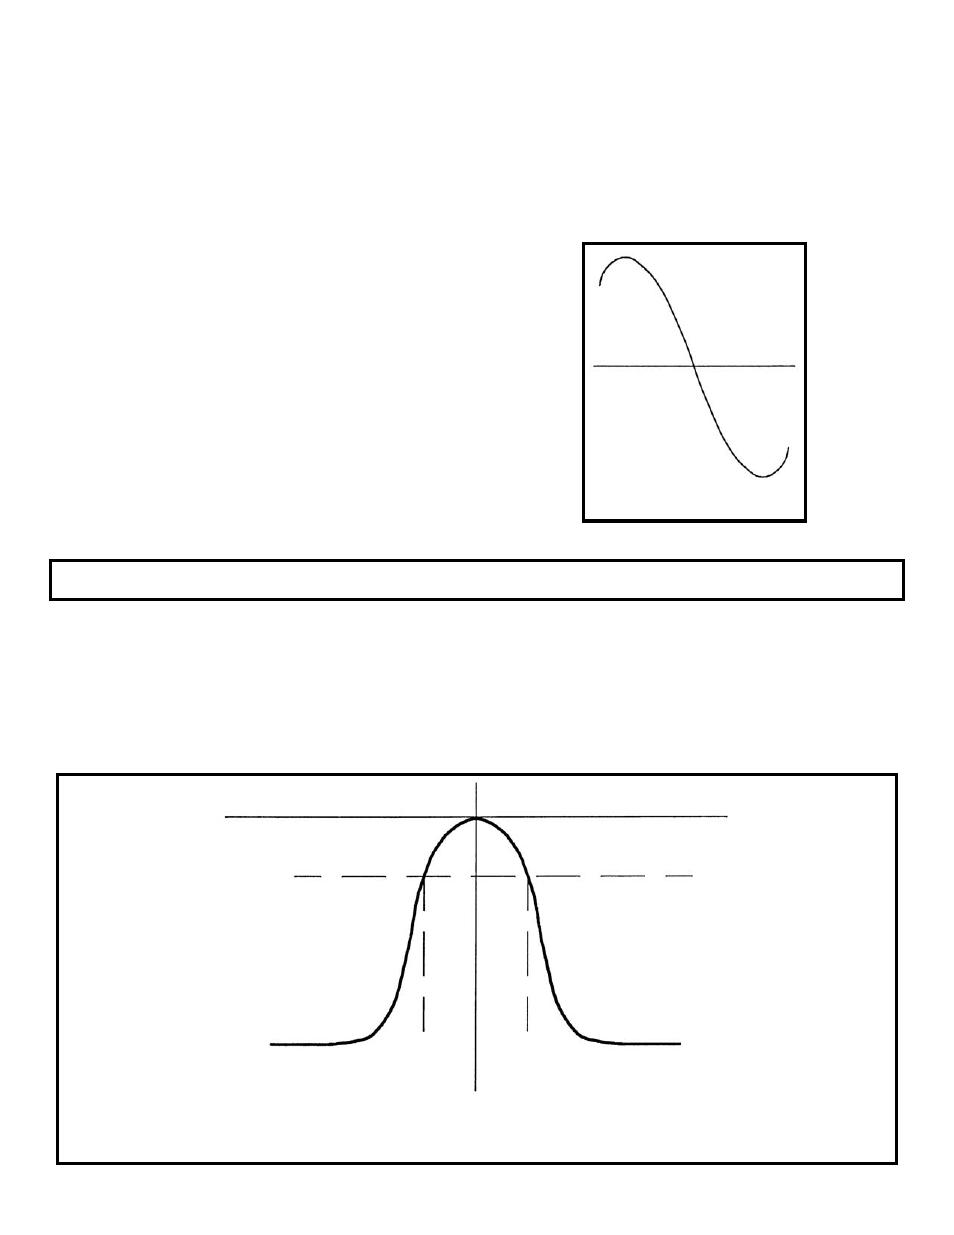 Elenco AM/FM Radio Kit User Manual | Page 46 / 64